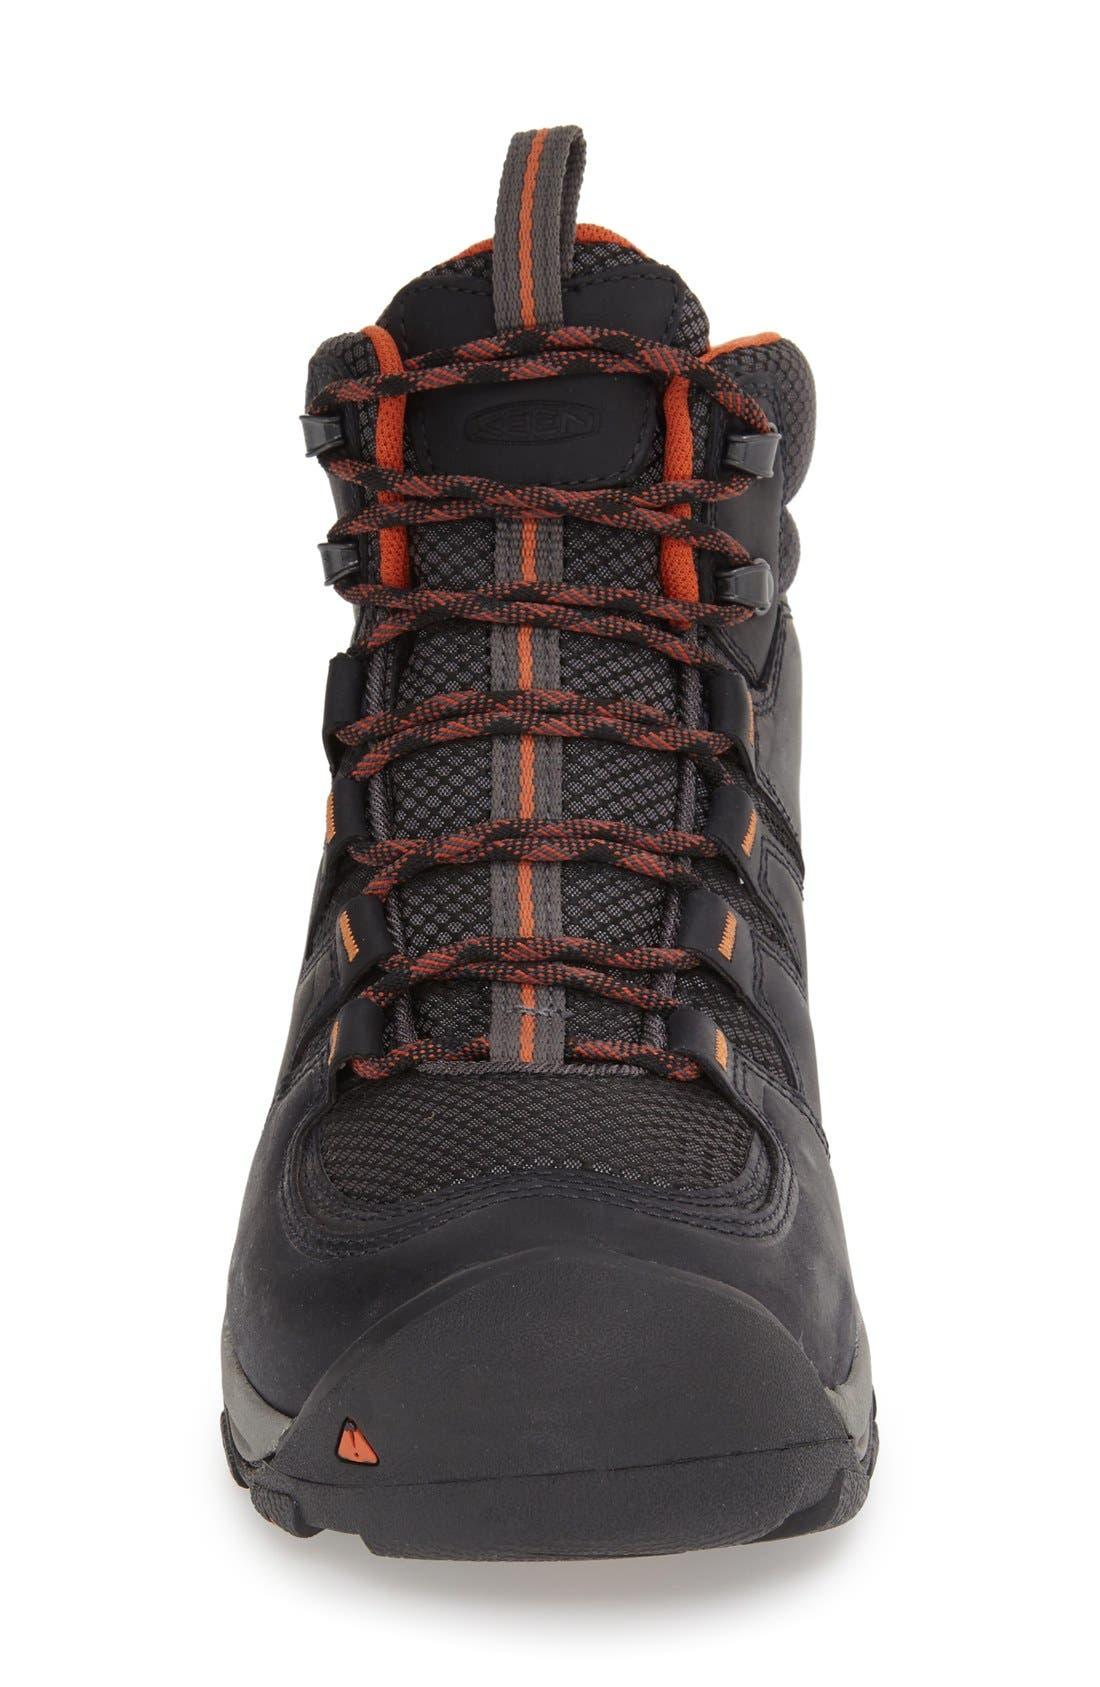 Gypsum II Waterproof Hiking Boot,                             Alternate thumbnail 3, color,                             BLACK NUBUCK LEATHER